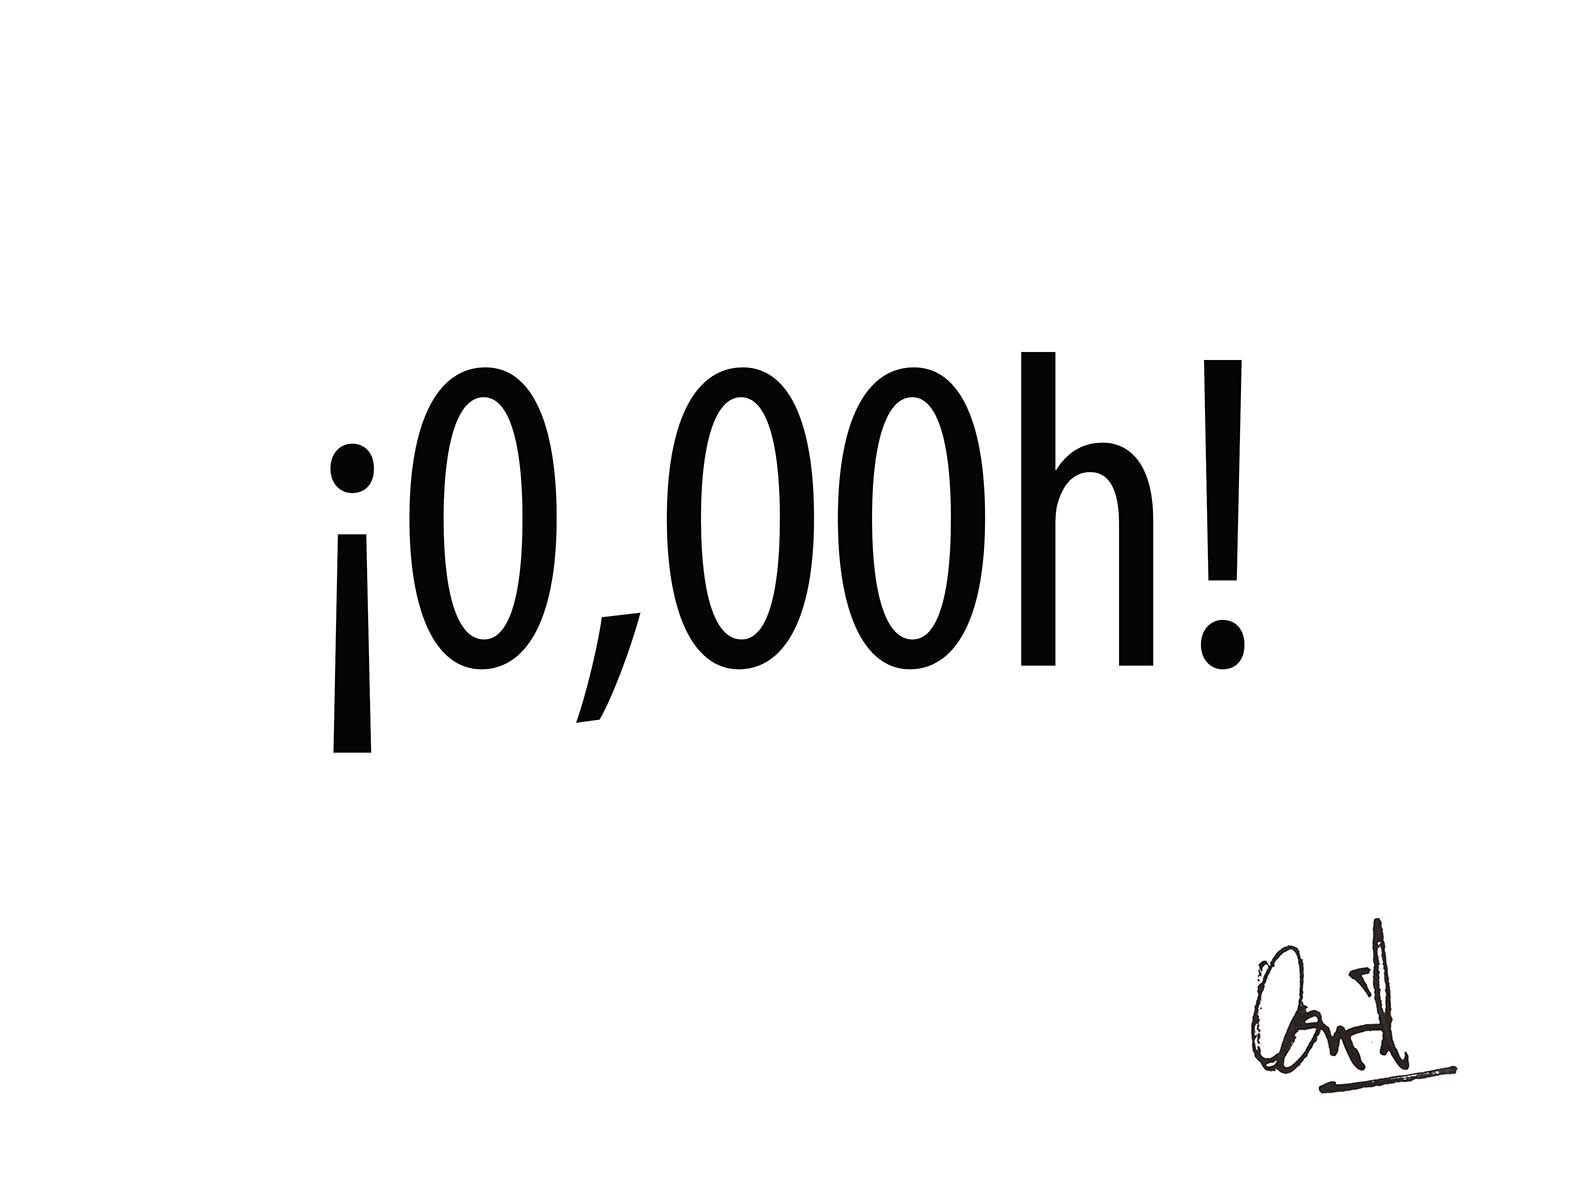 ¡0,00h! (Caligrama, Poema Visual)